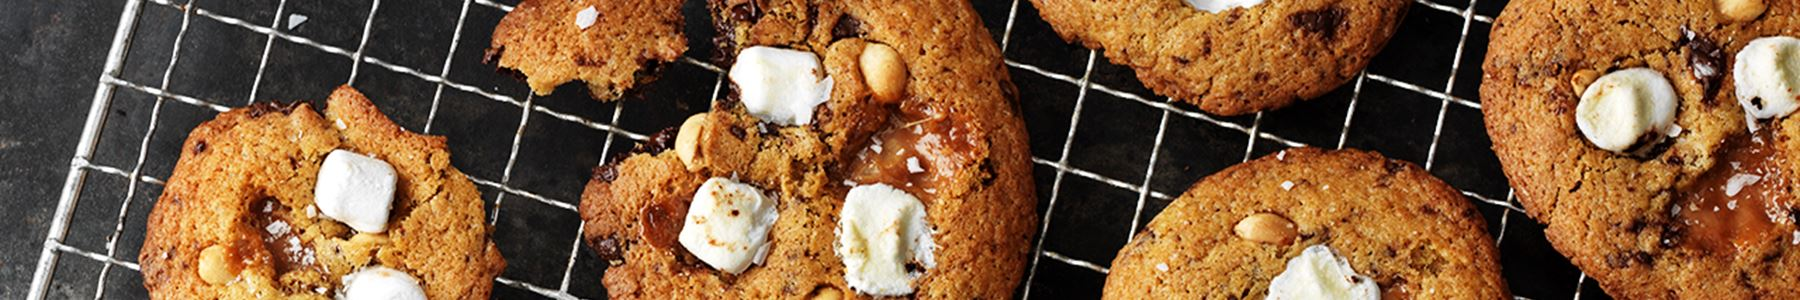 Snabb + Cookies + Kola